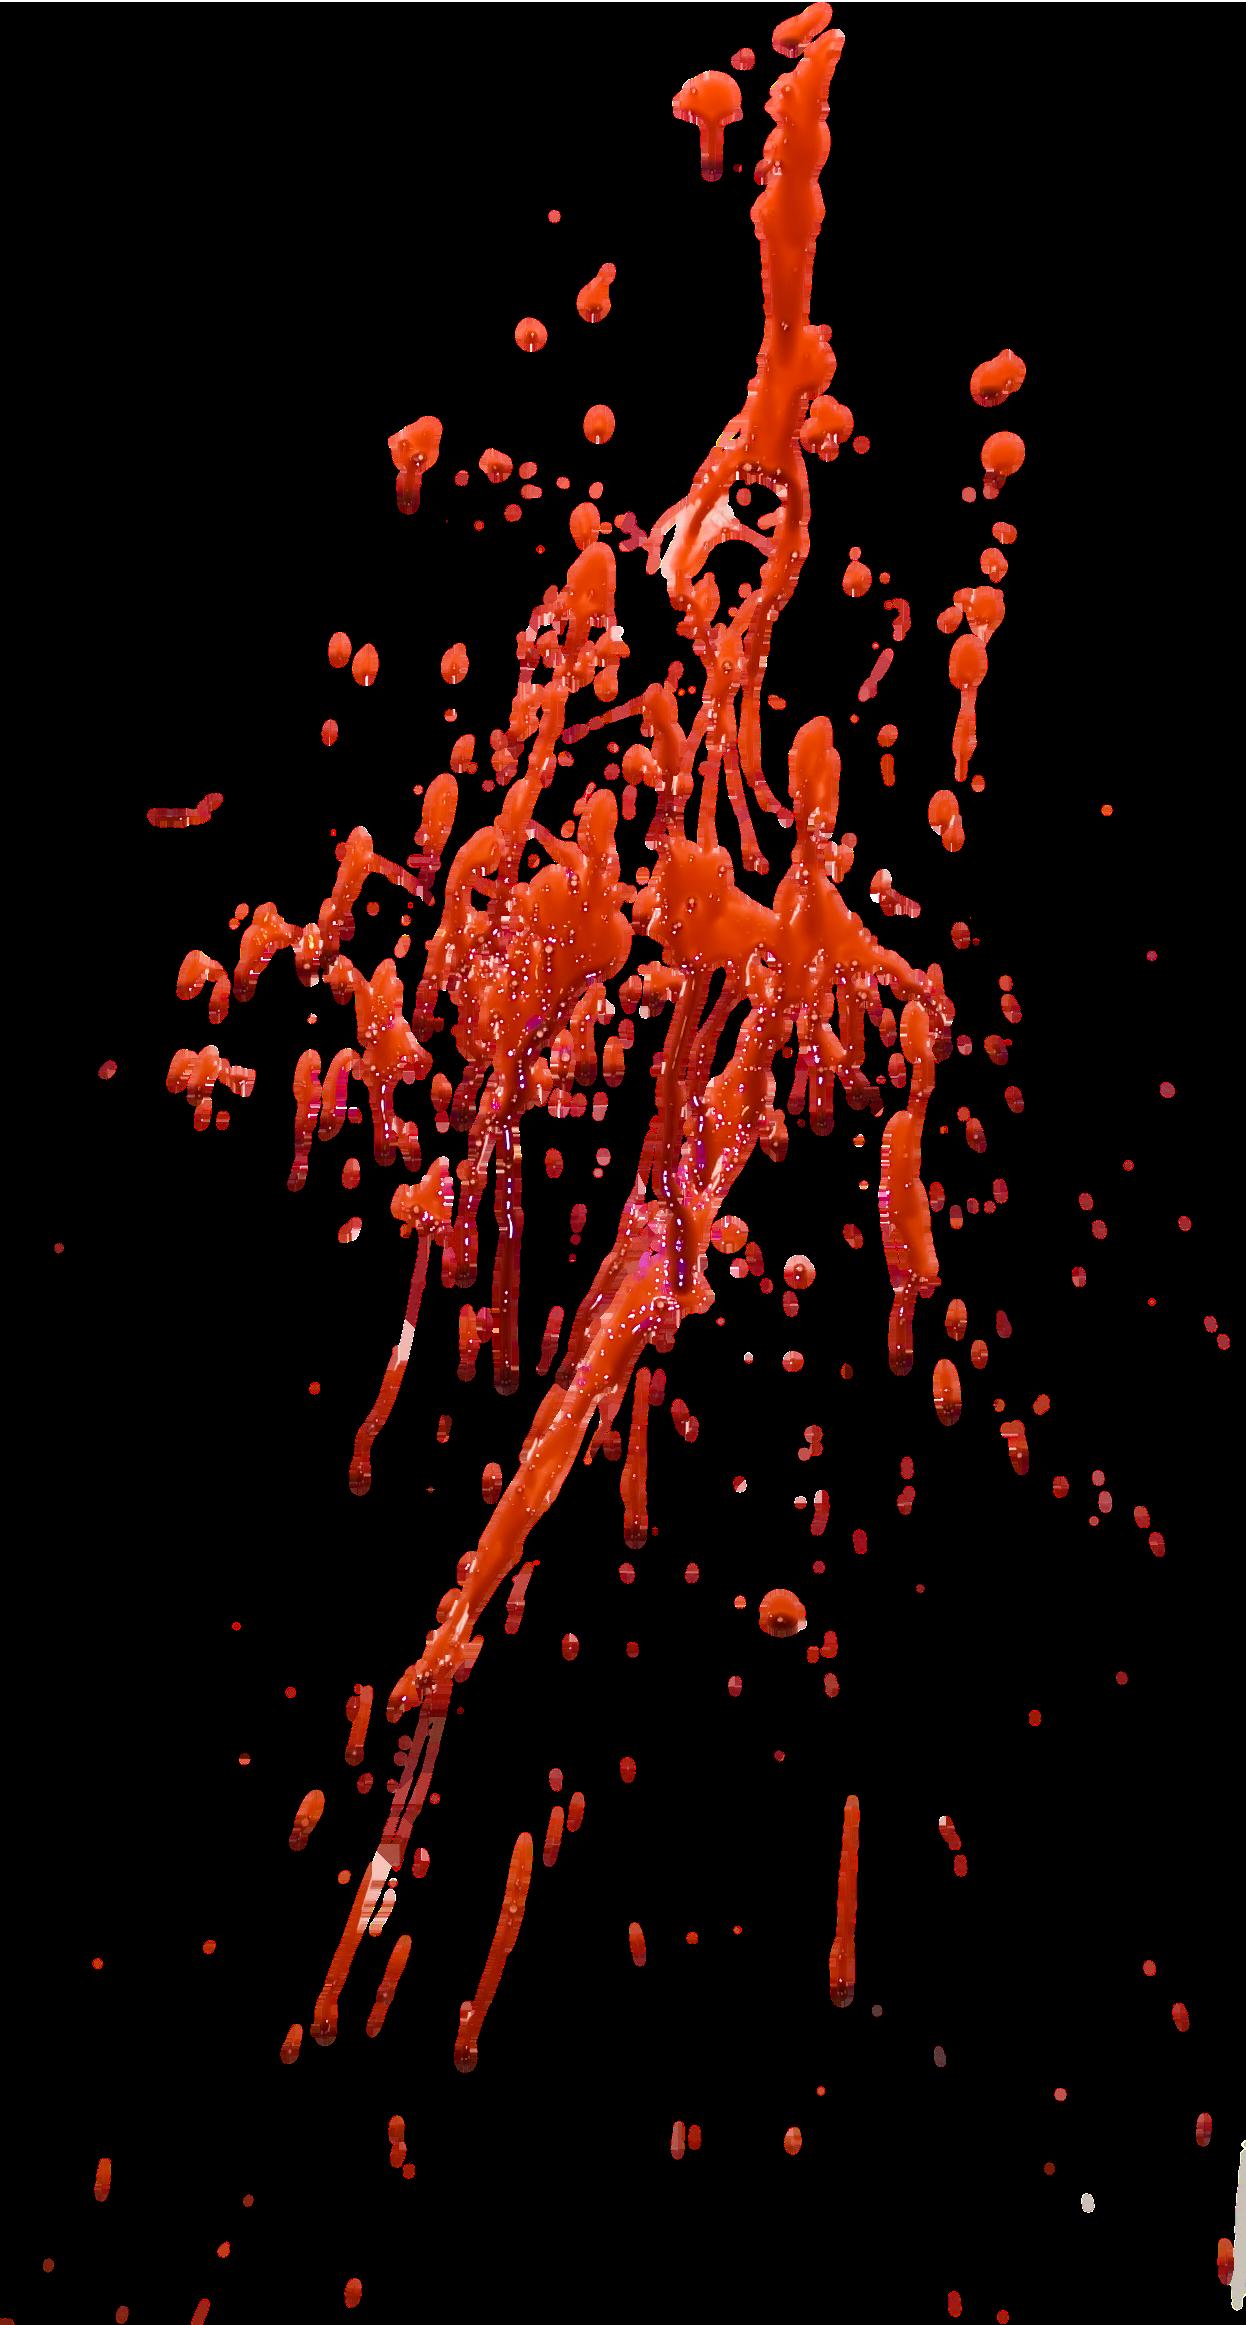 Images free download splashes. Blood png transparente